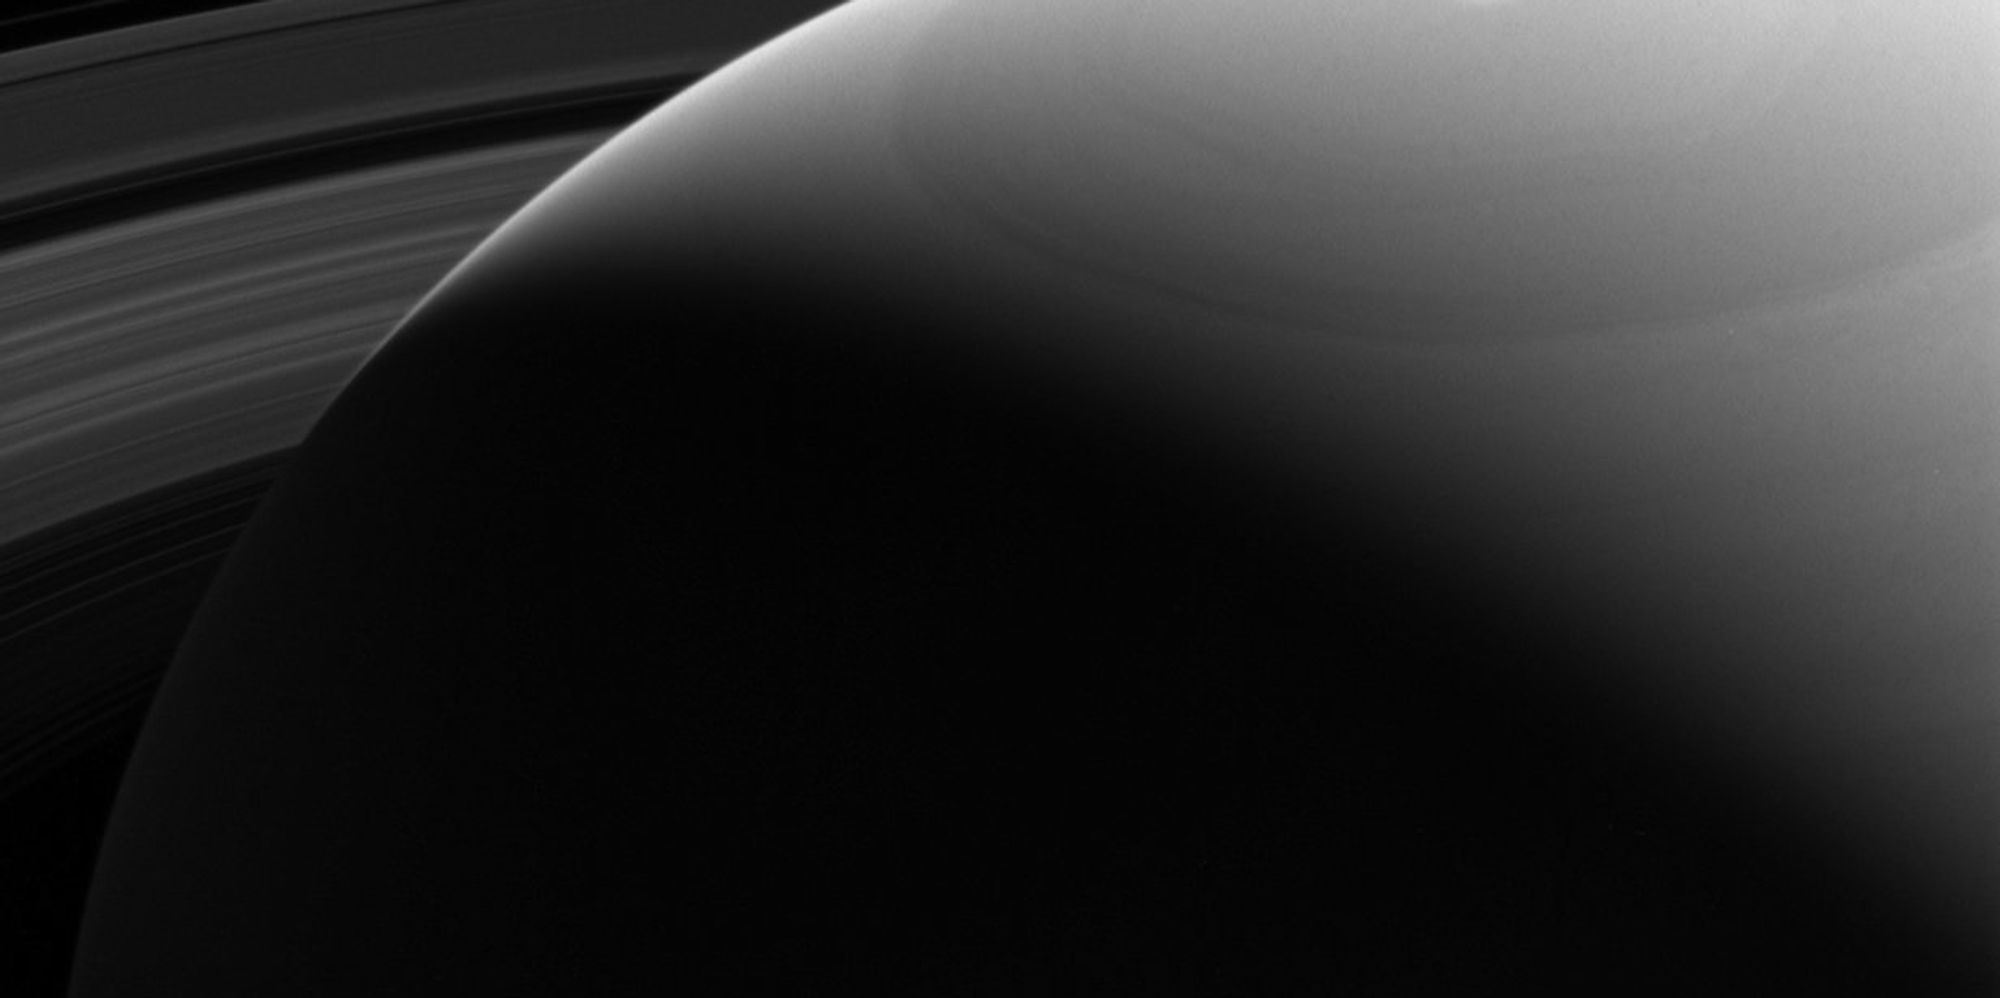 cassini saturn rings close up - photo #43